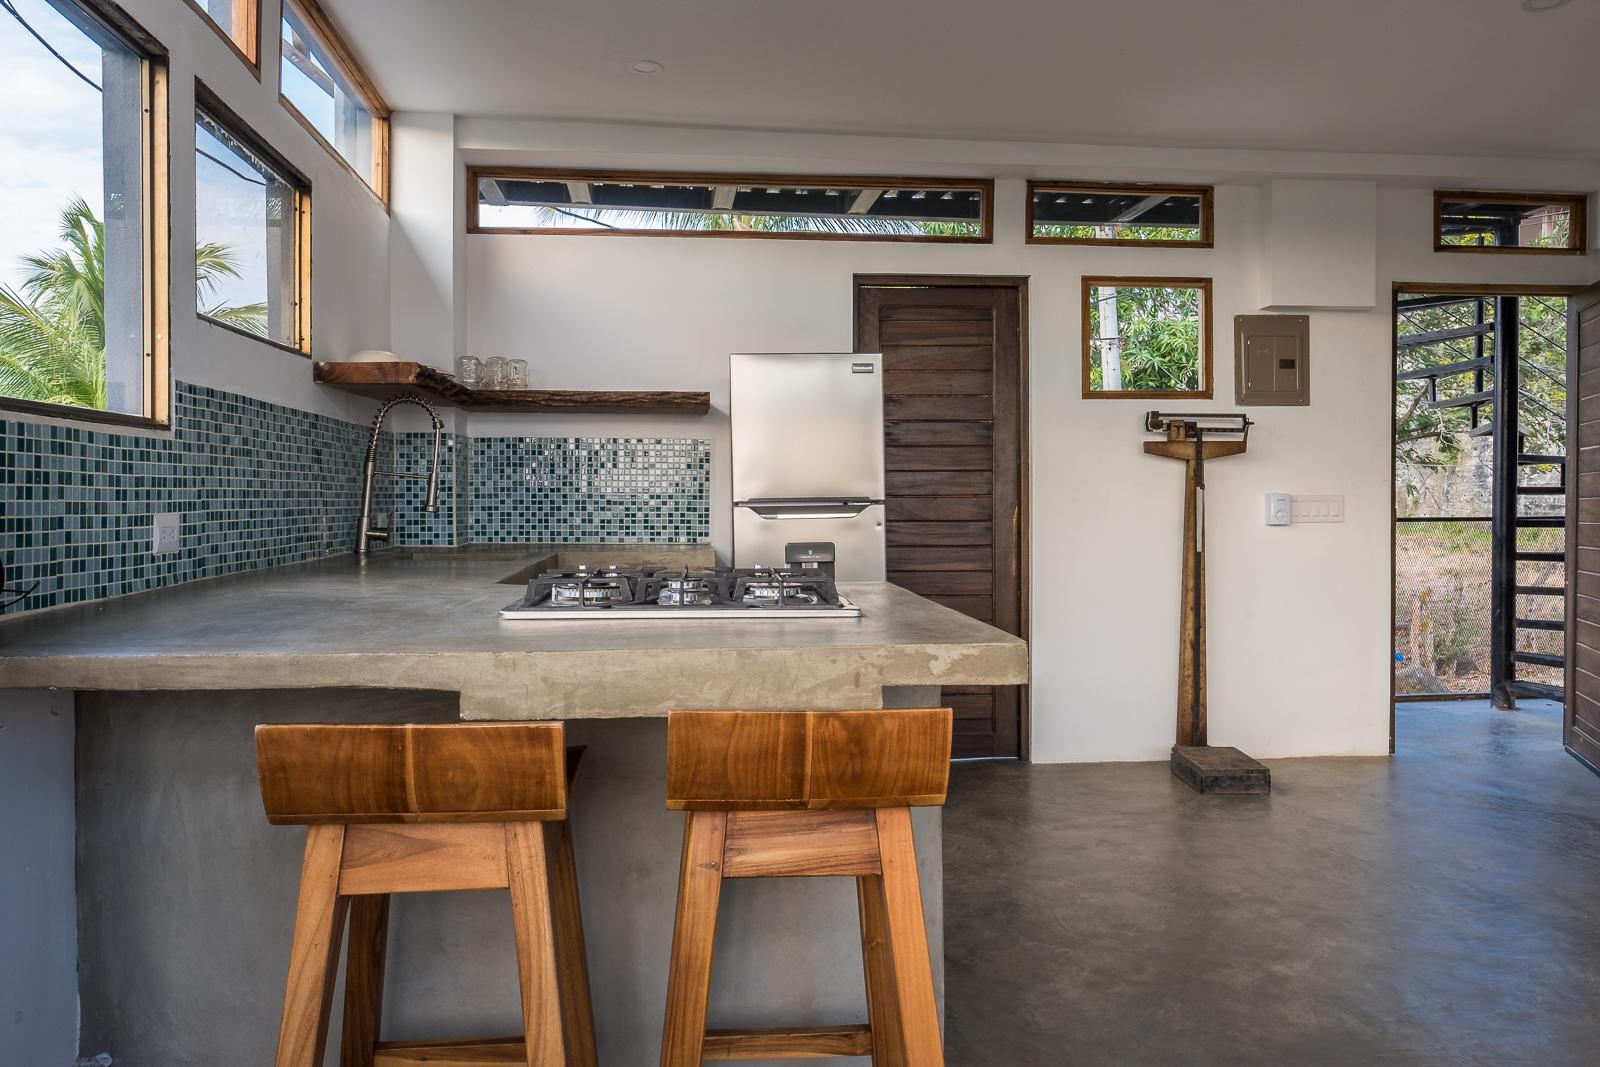 Property for sale in San Juan Del Sur Nicaragua, Social House 13.jpg